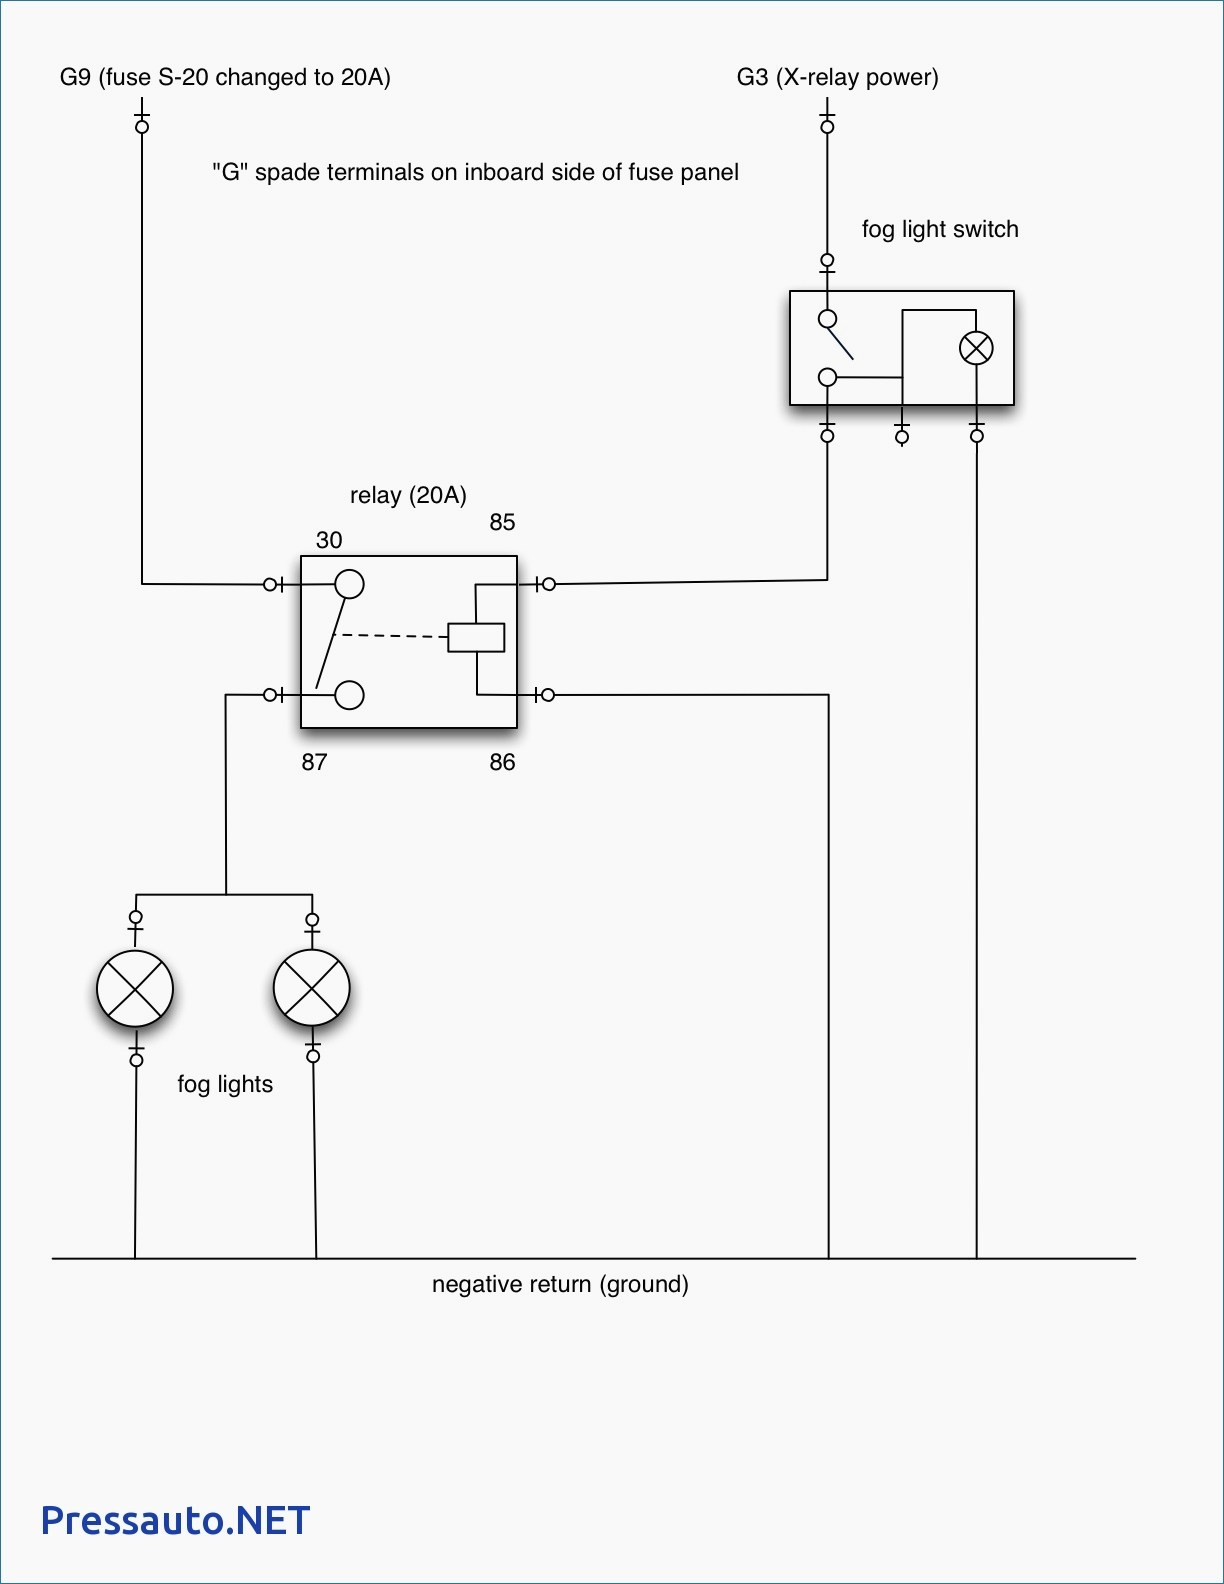 Kc fog light wiring diagram wiring diagram fog light wiring diagram wiring diagram image kc lights plug kc fog light wiring diagram cheapraybanclubmaster Images